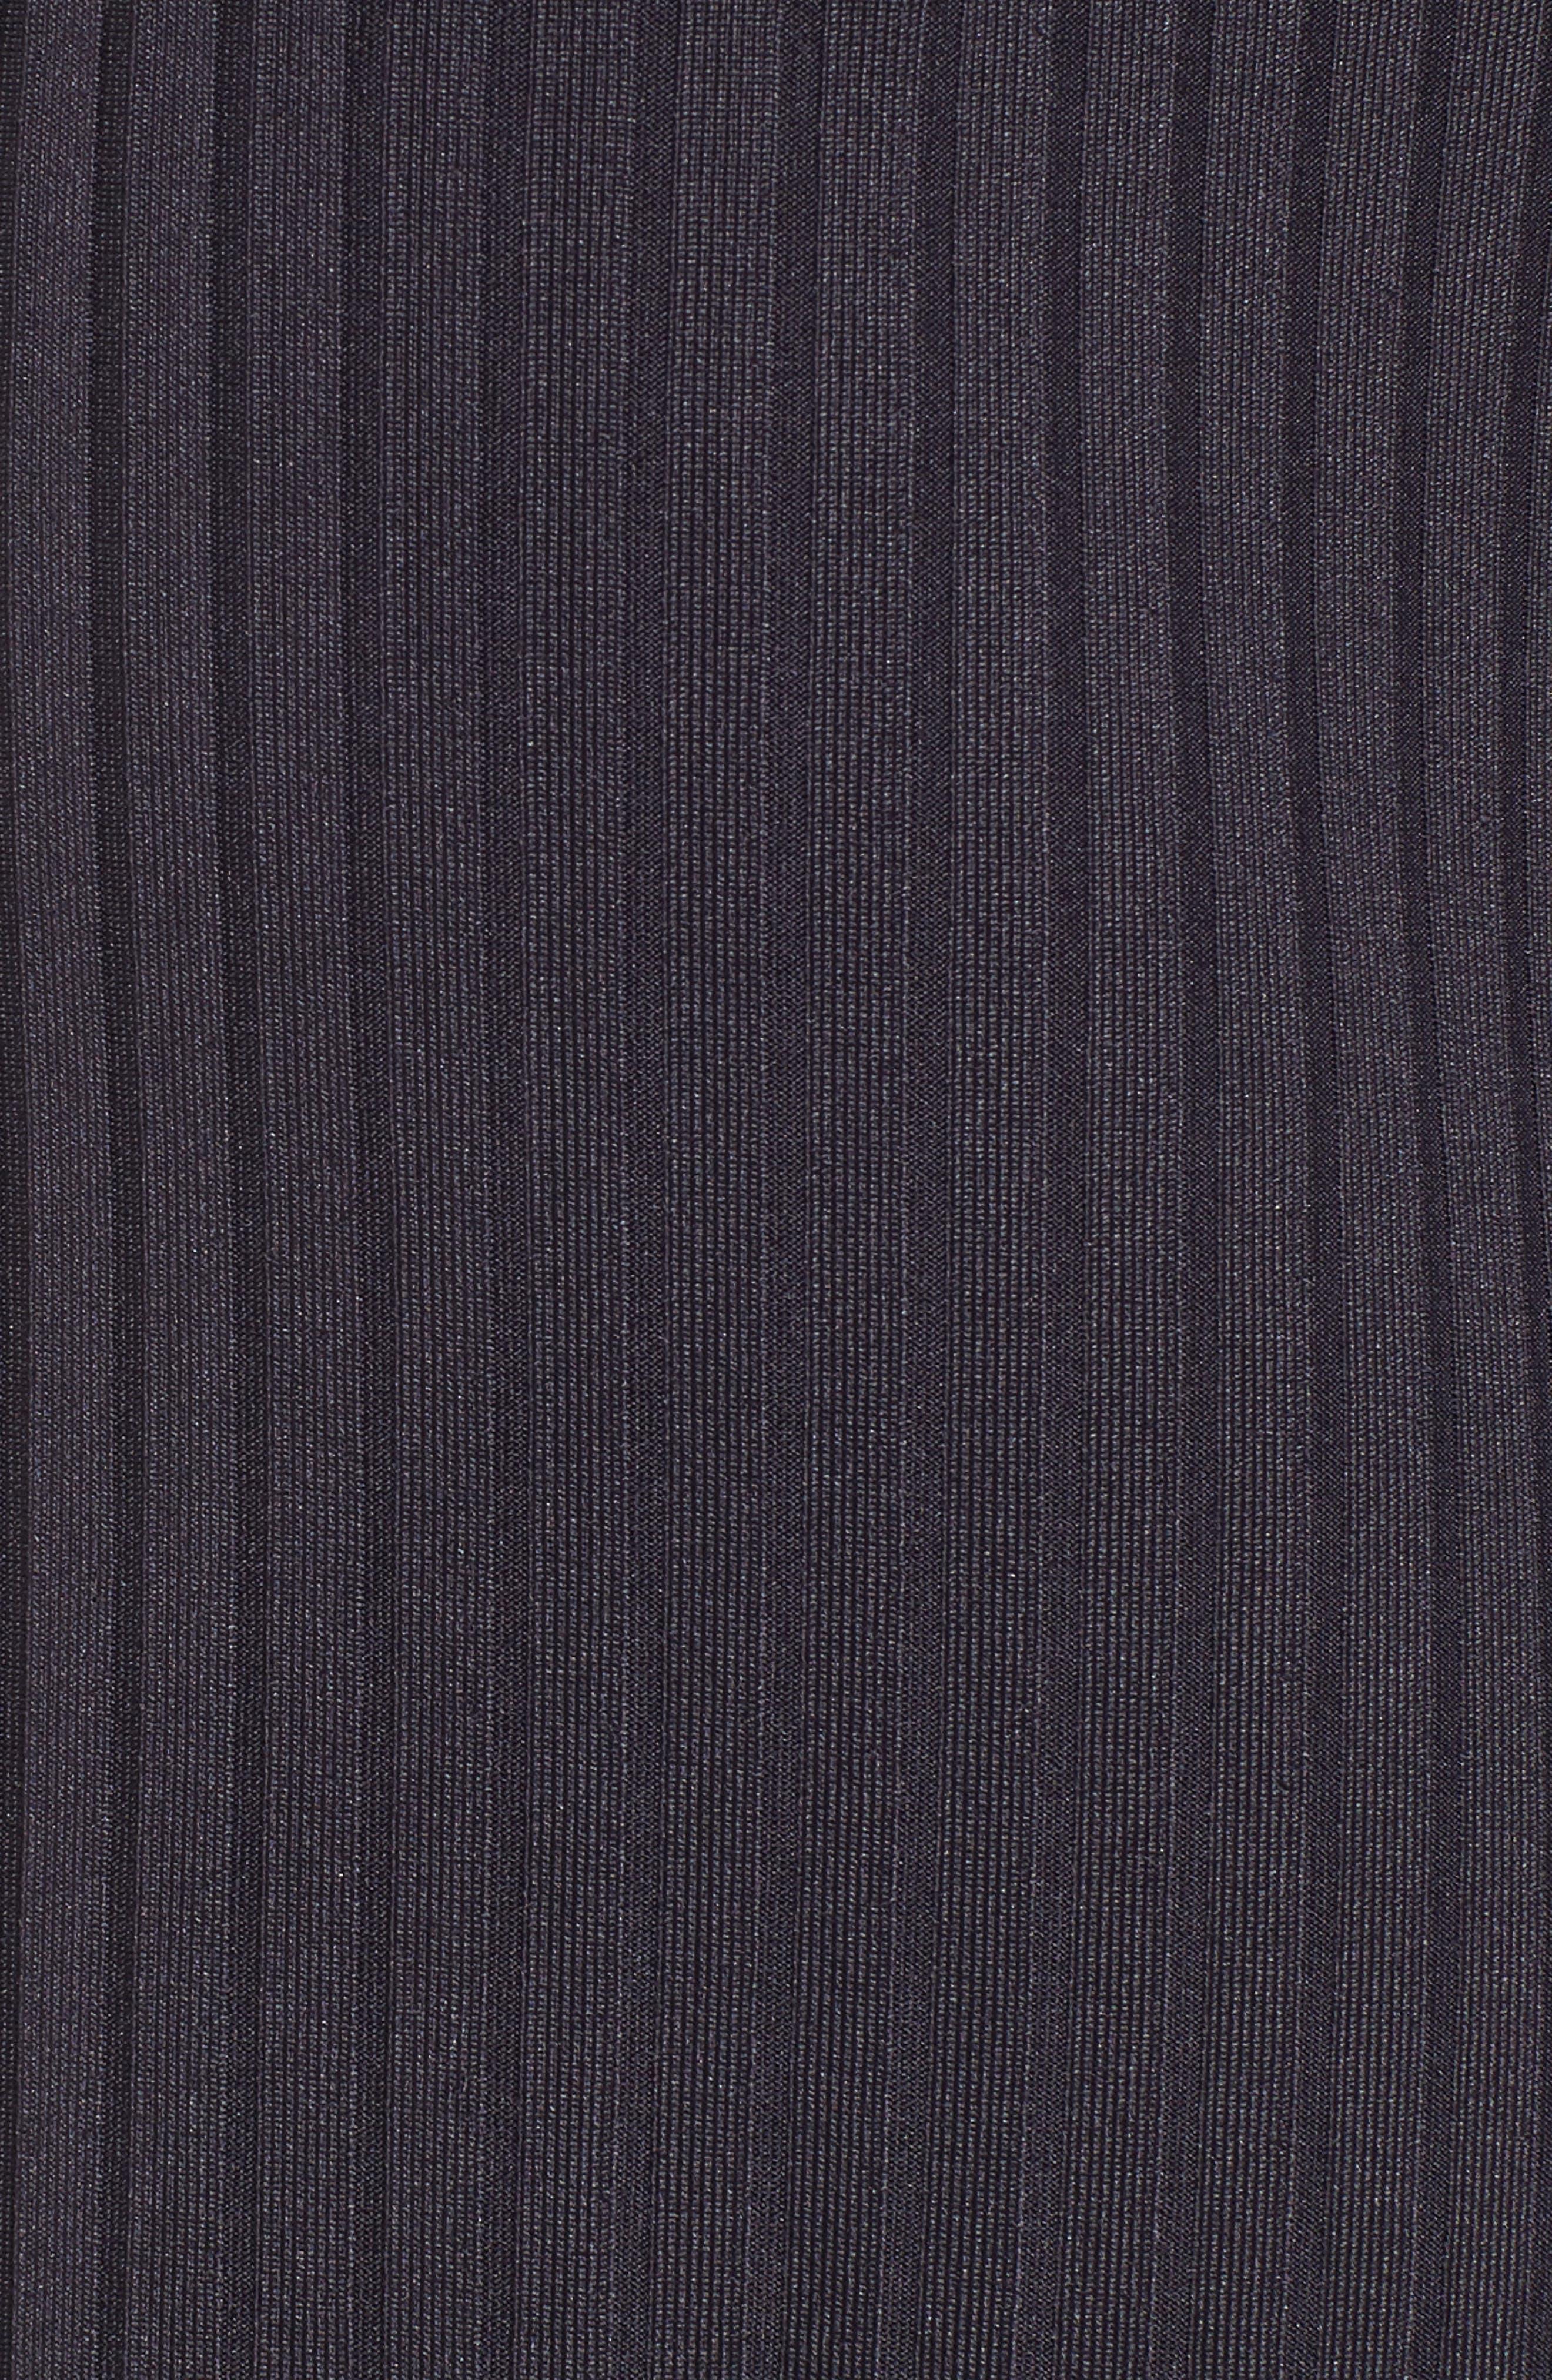 Jefferson Cropped Pant,                             Alternate thumbnail 5, color,                             406